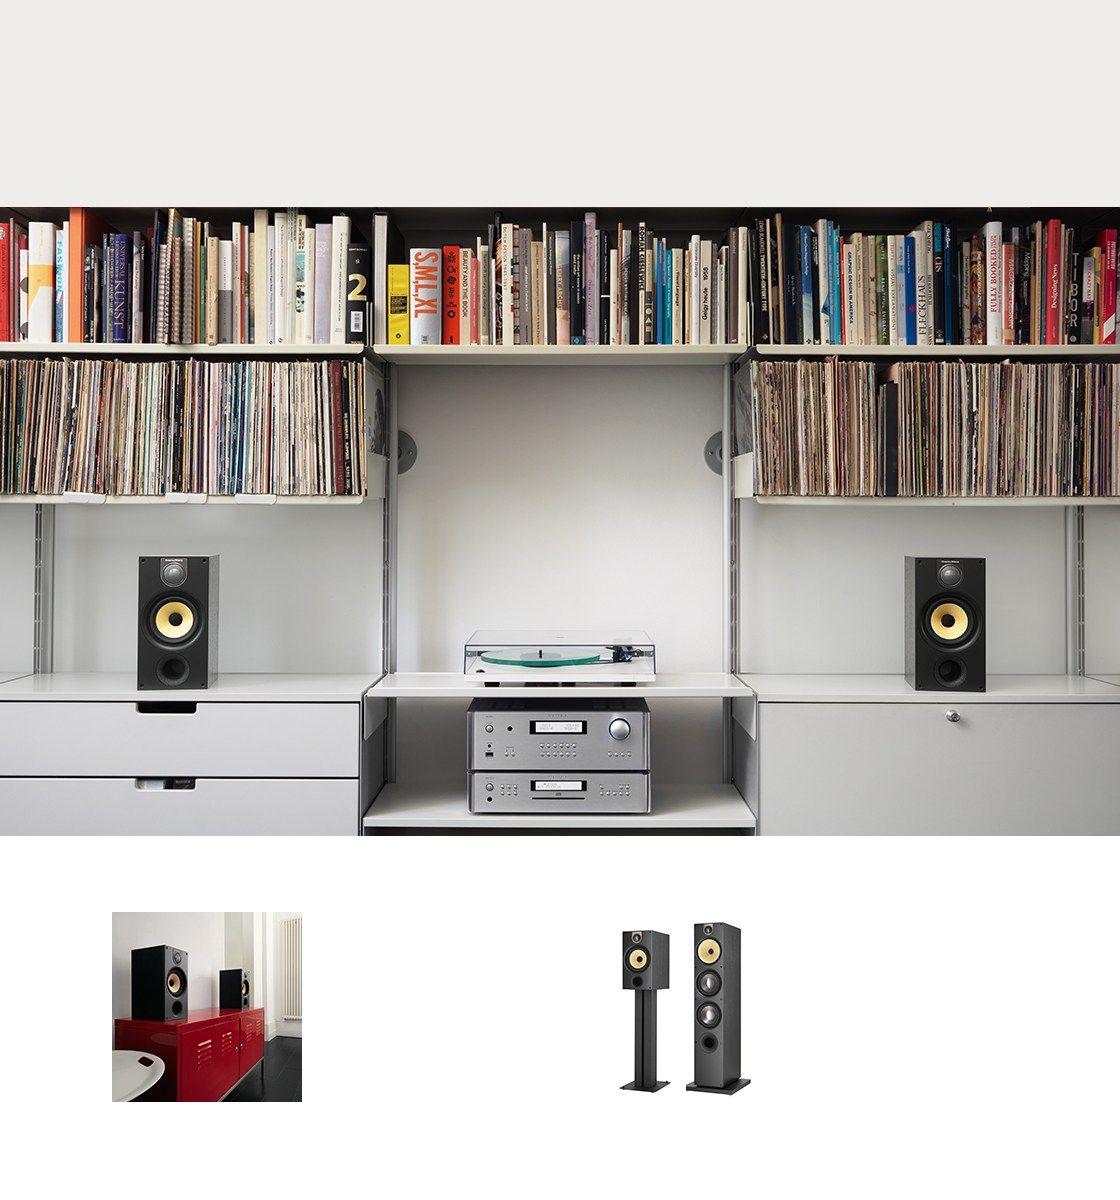 ugra.ru - Настенная акустическая система PSB Imagine S Surround #sounddreams #sale #psb #speakers | Home Theater | Home theater, Theatre